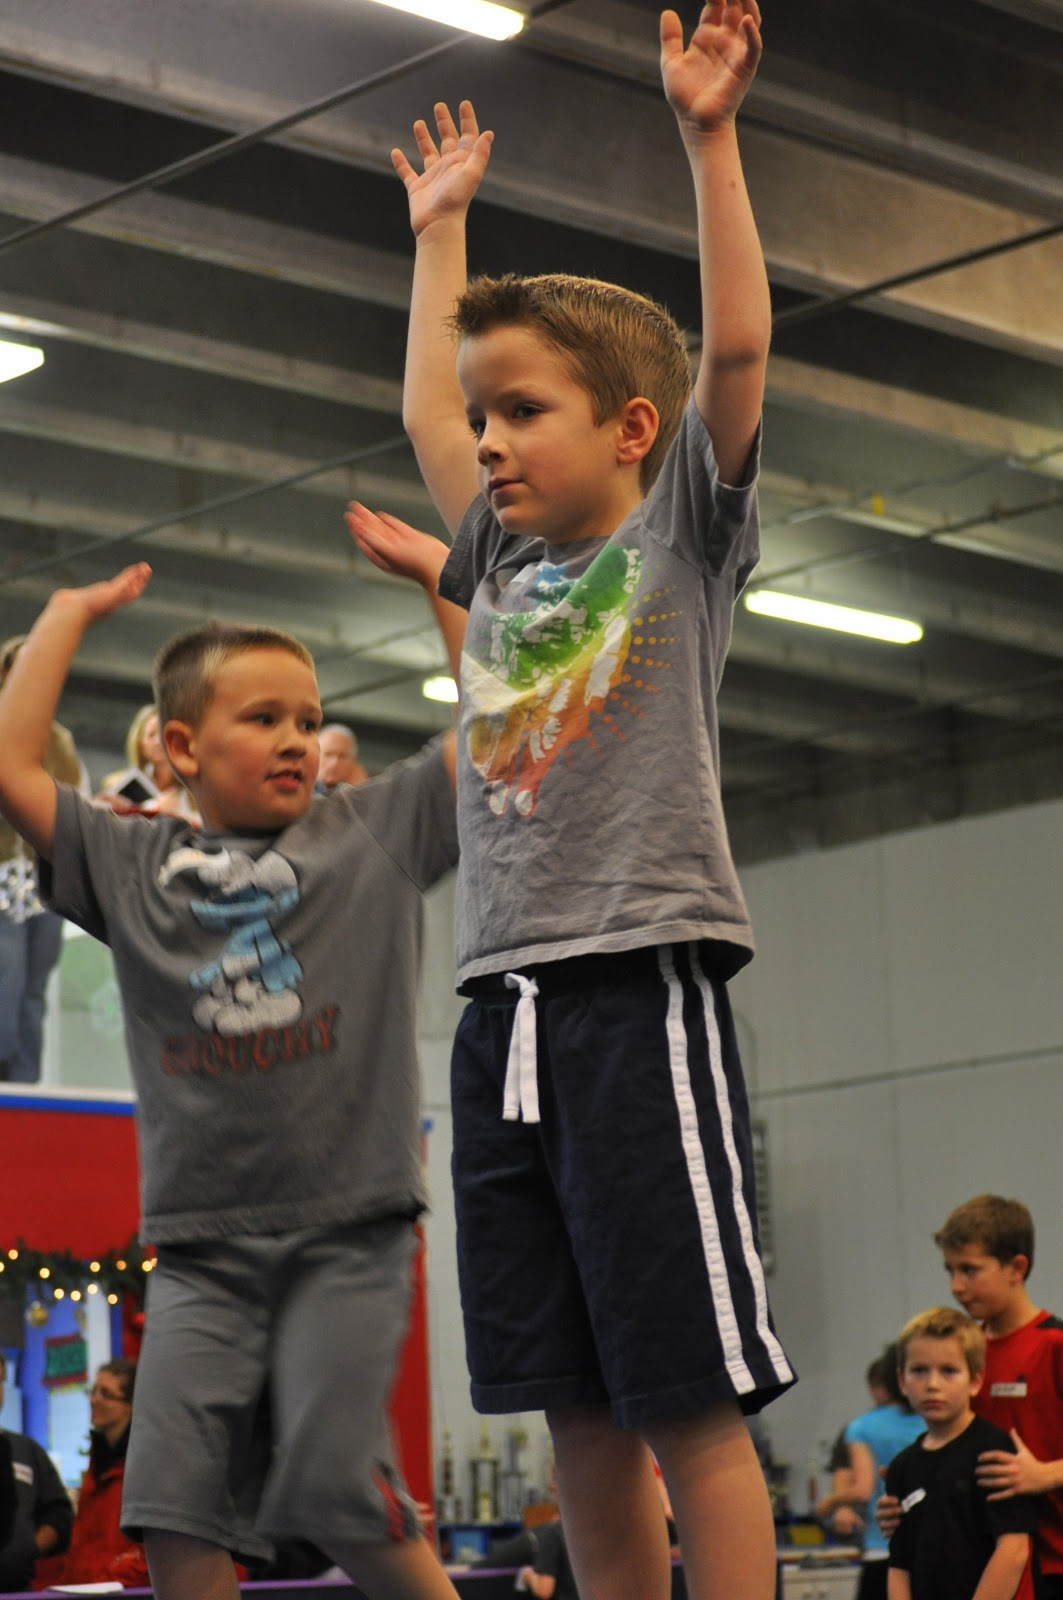 Adding to the family: Abbys Gymnastics